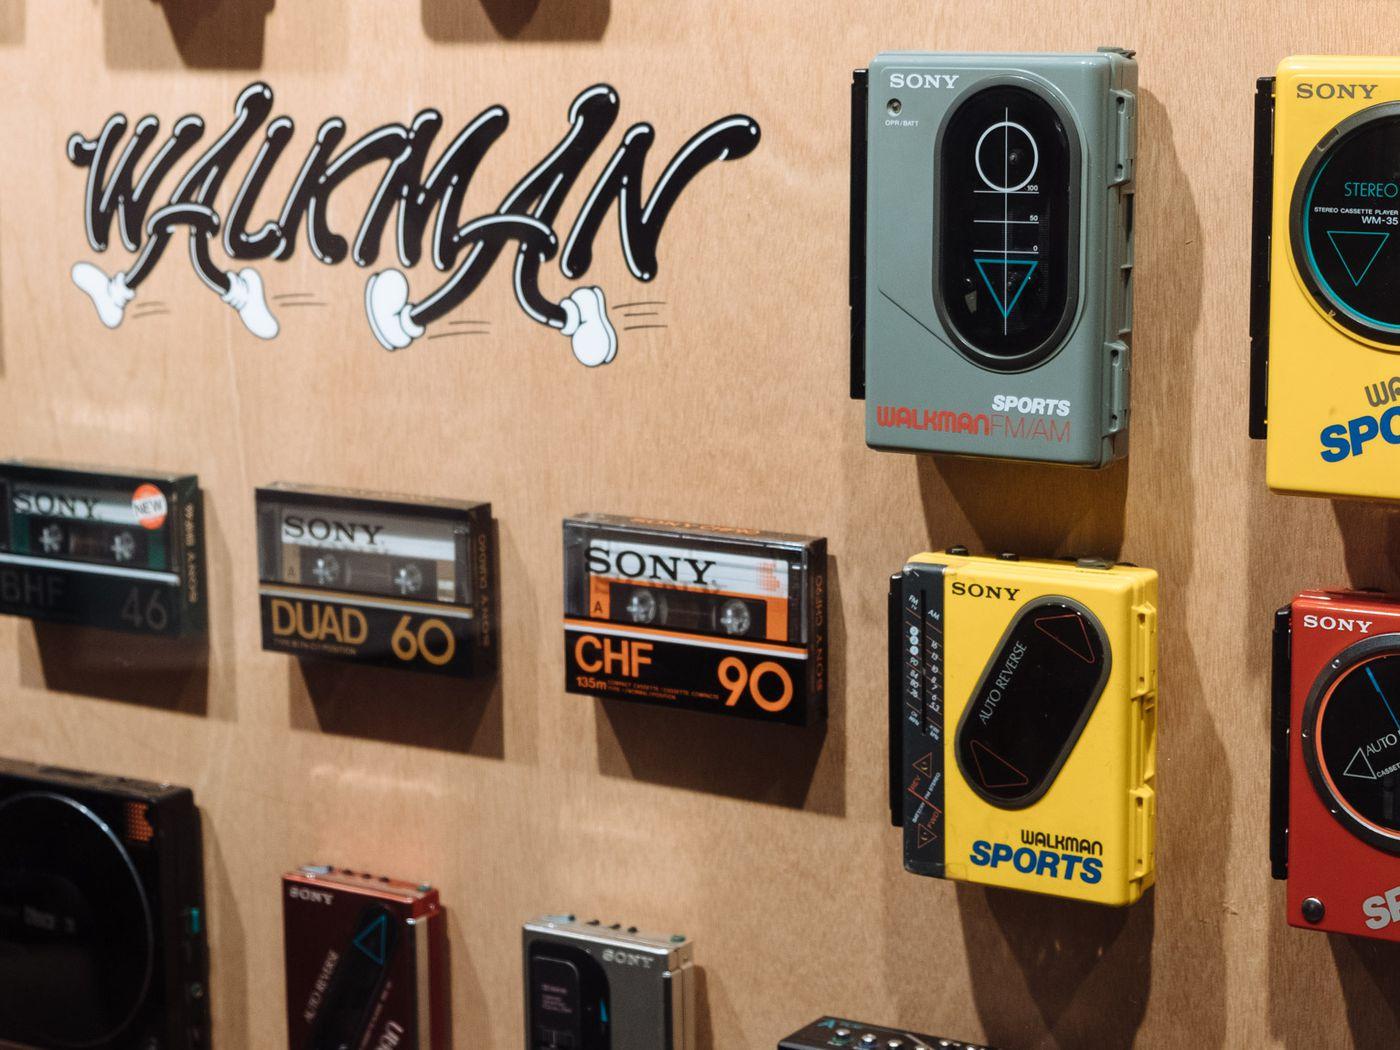 Sony Celebrates 40 Years Of Walkman In Tokyo The Verge